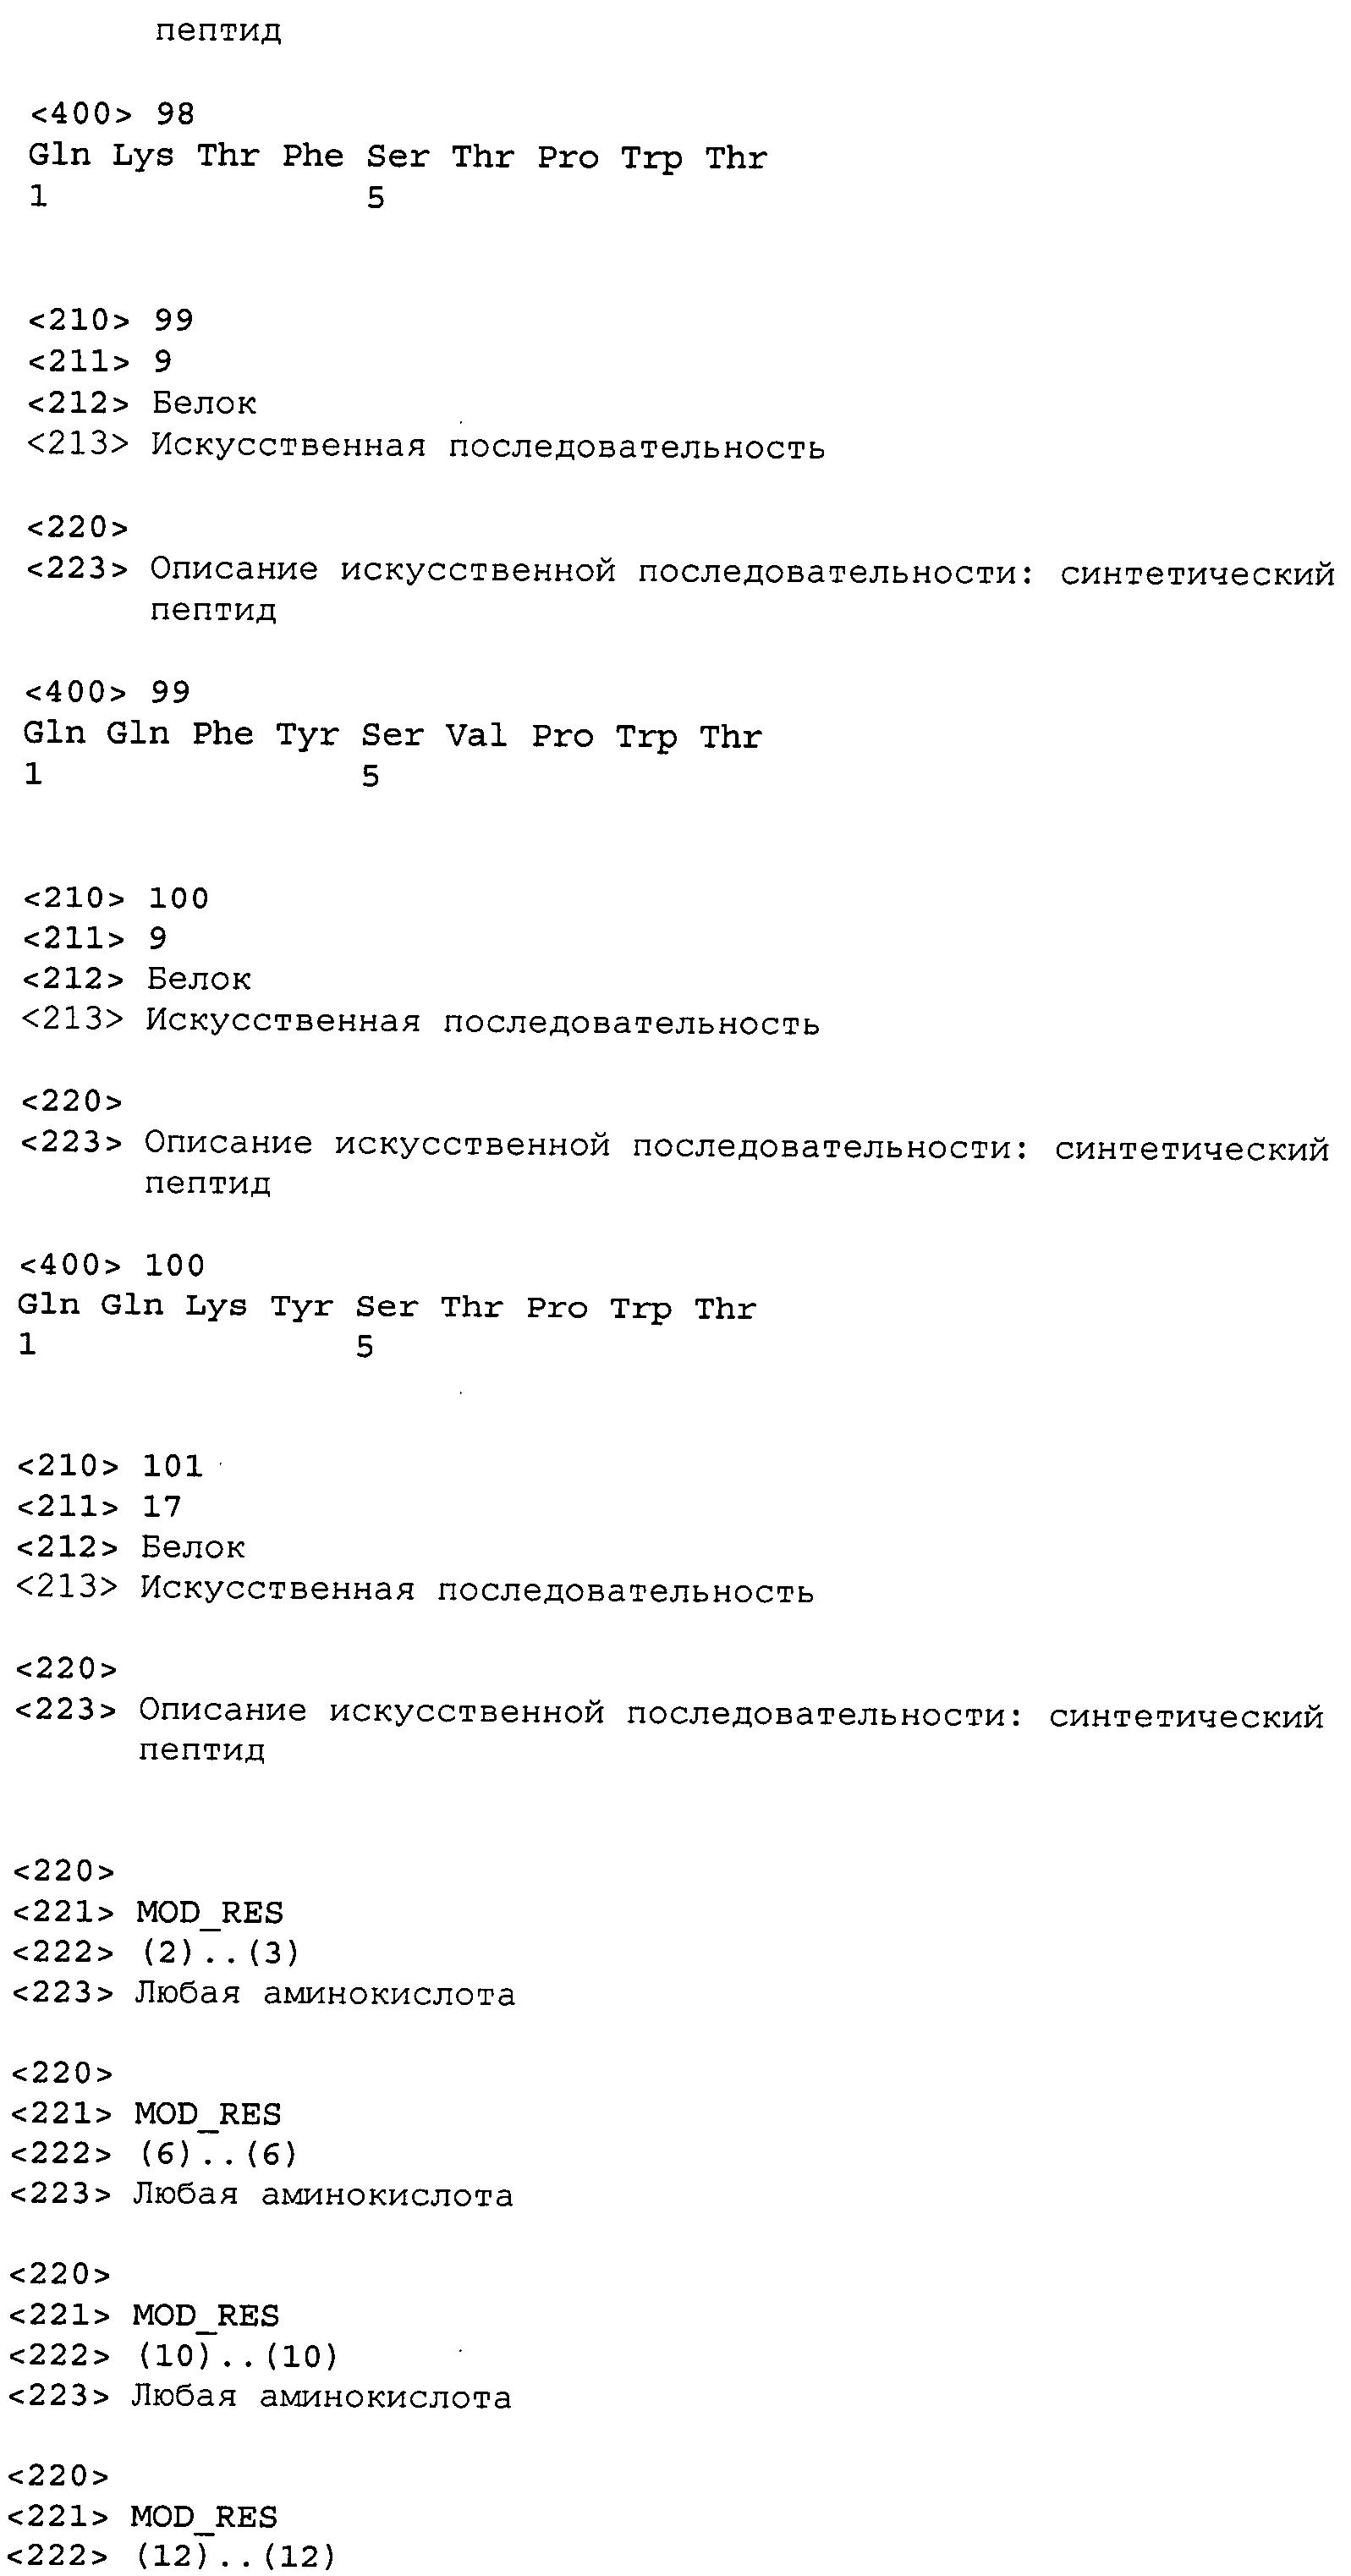 Figure 00000334